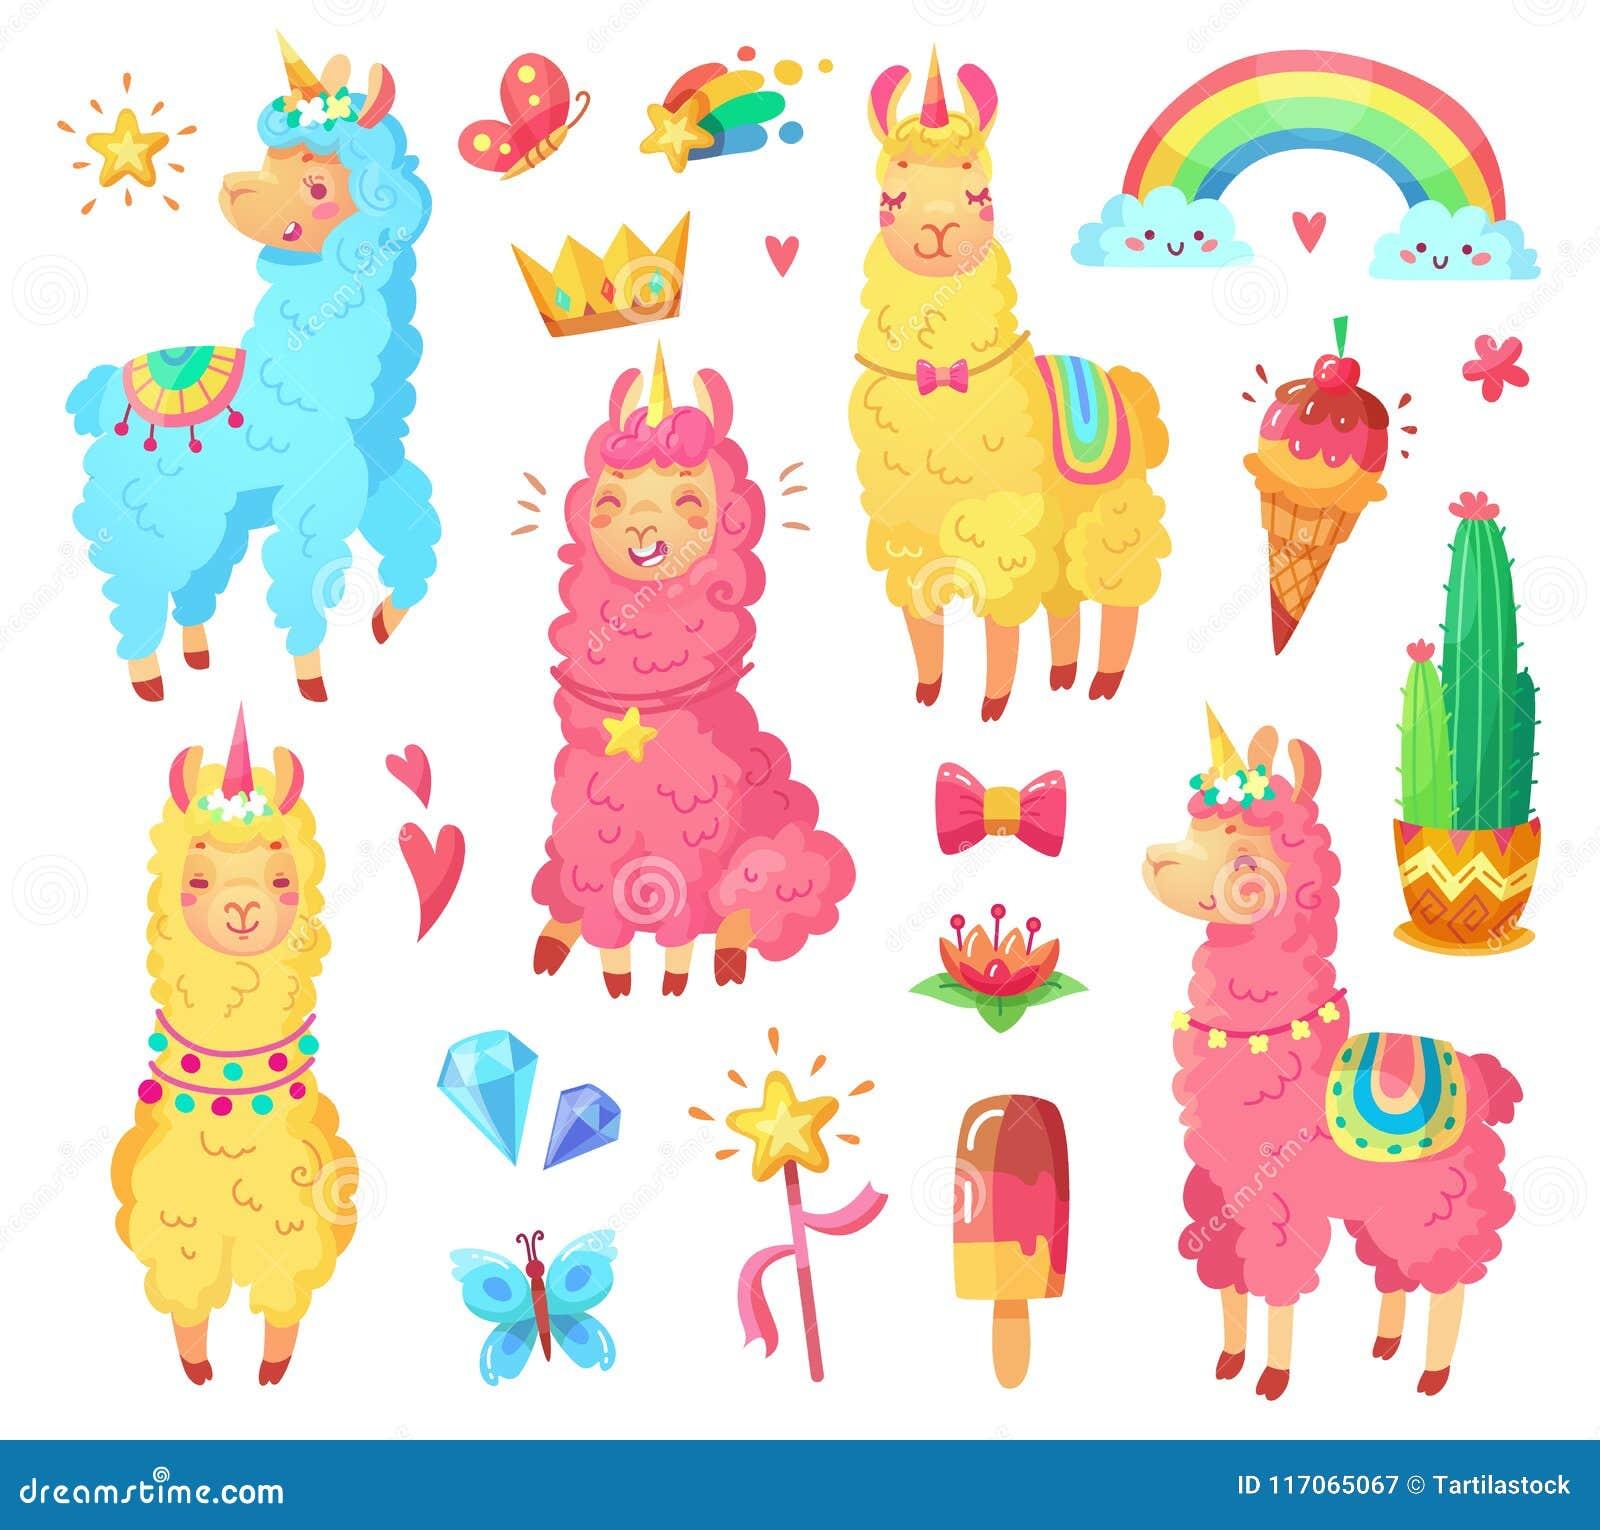 Funny mexican smiling alpaca with fluffy wool and cute rainbow llama unicorn. Magic pets cartoon illustration set